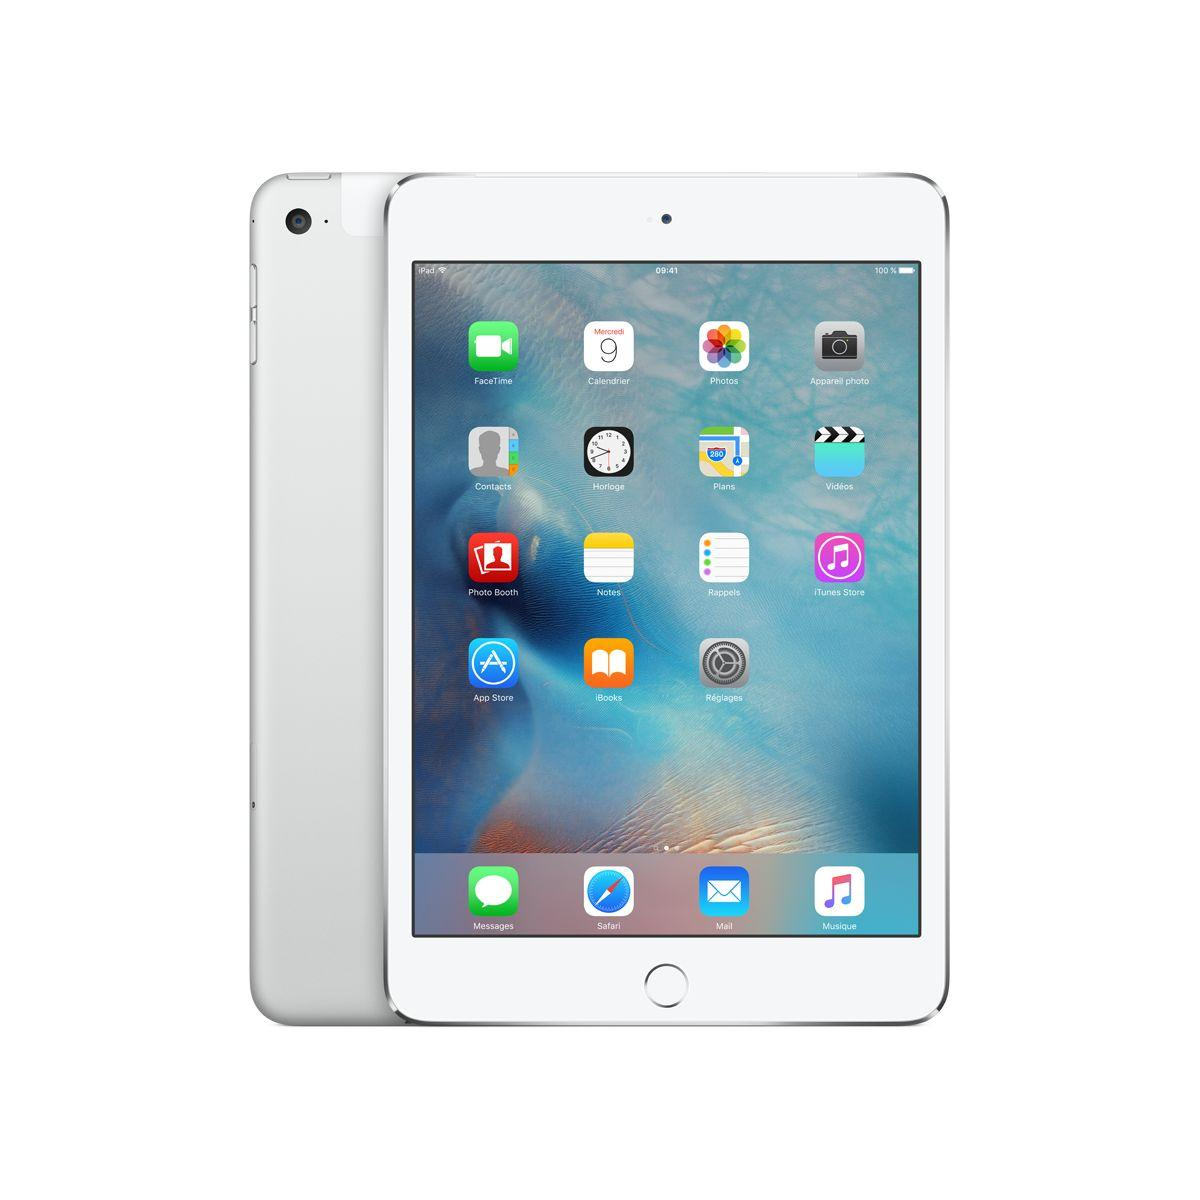 Apple ipad mini 4 128go cellular argent (photo)